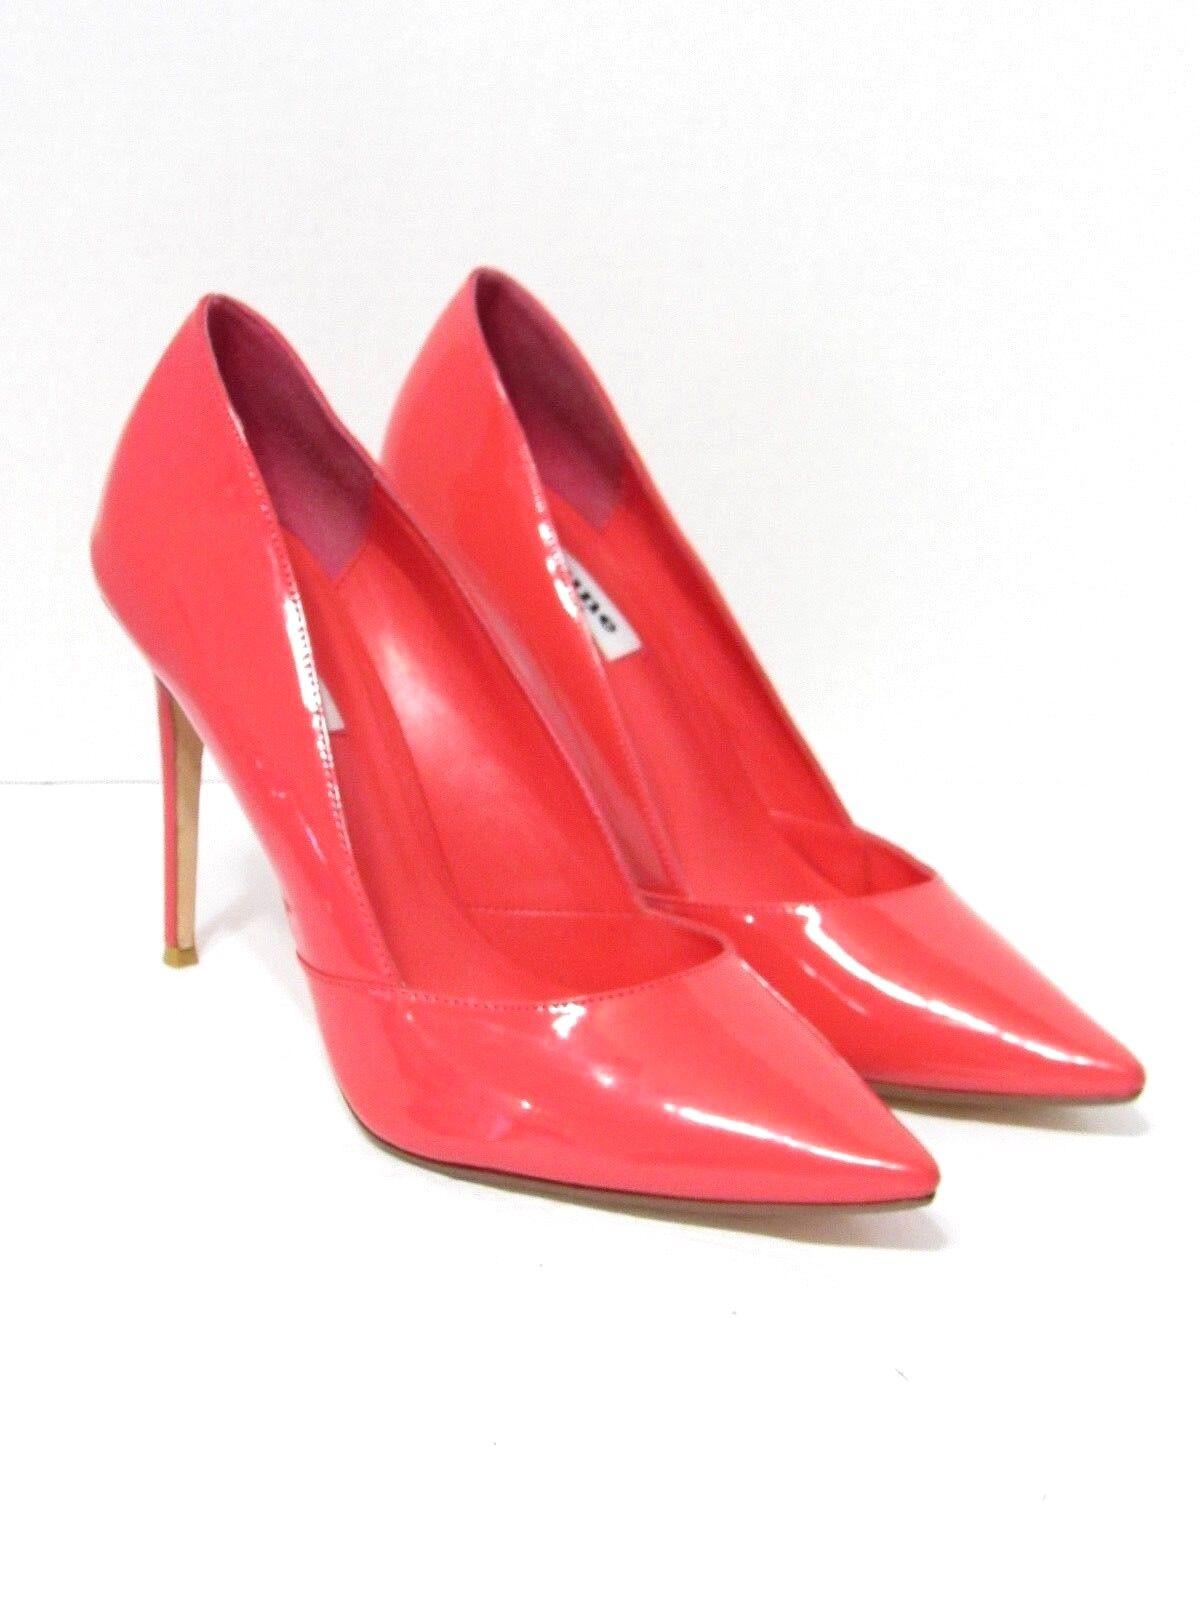 DUNE LONDON Rosa Leather Leather Leather Patent Classic Pumps Heel schuhe SZ 40  10 88e84a